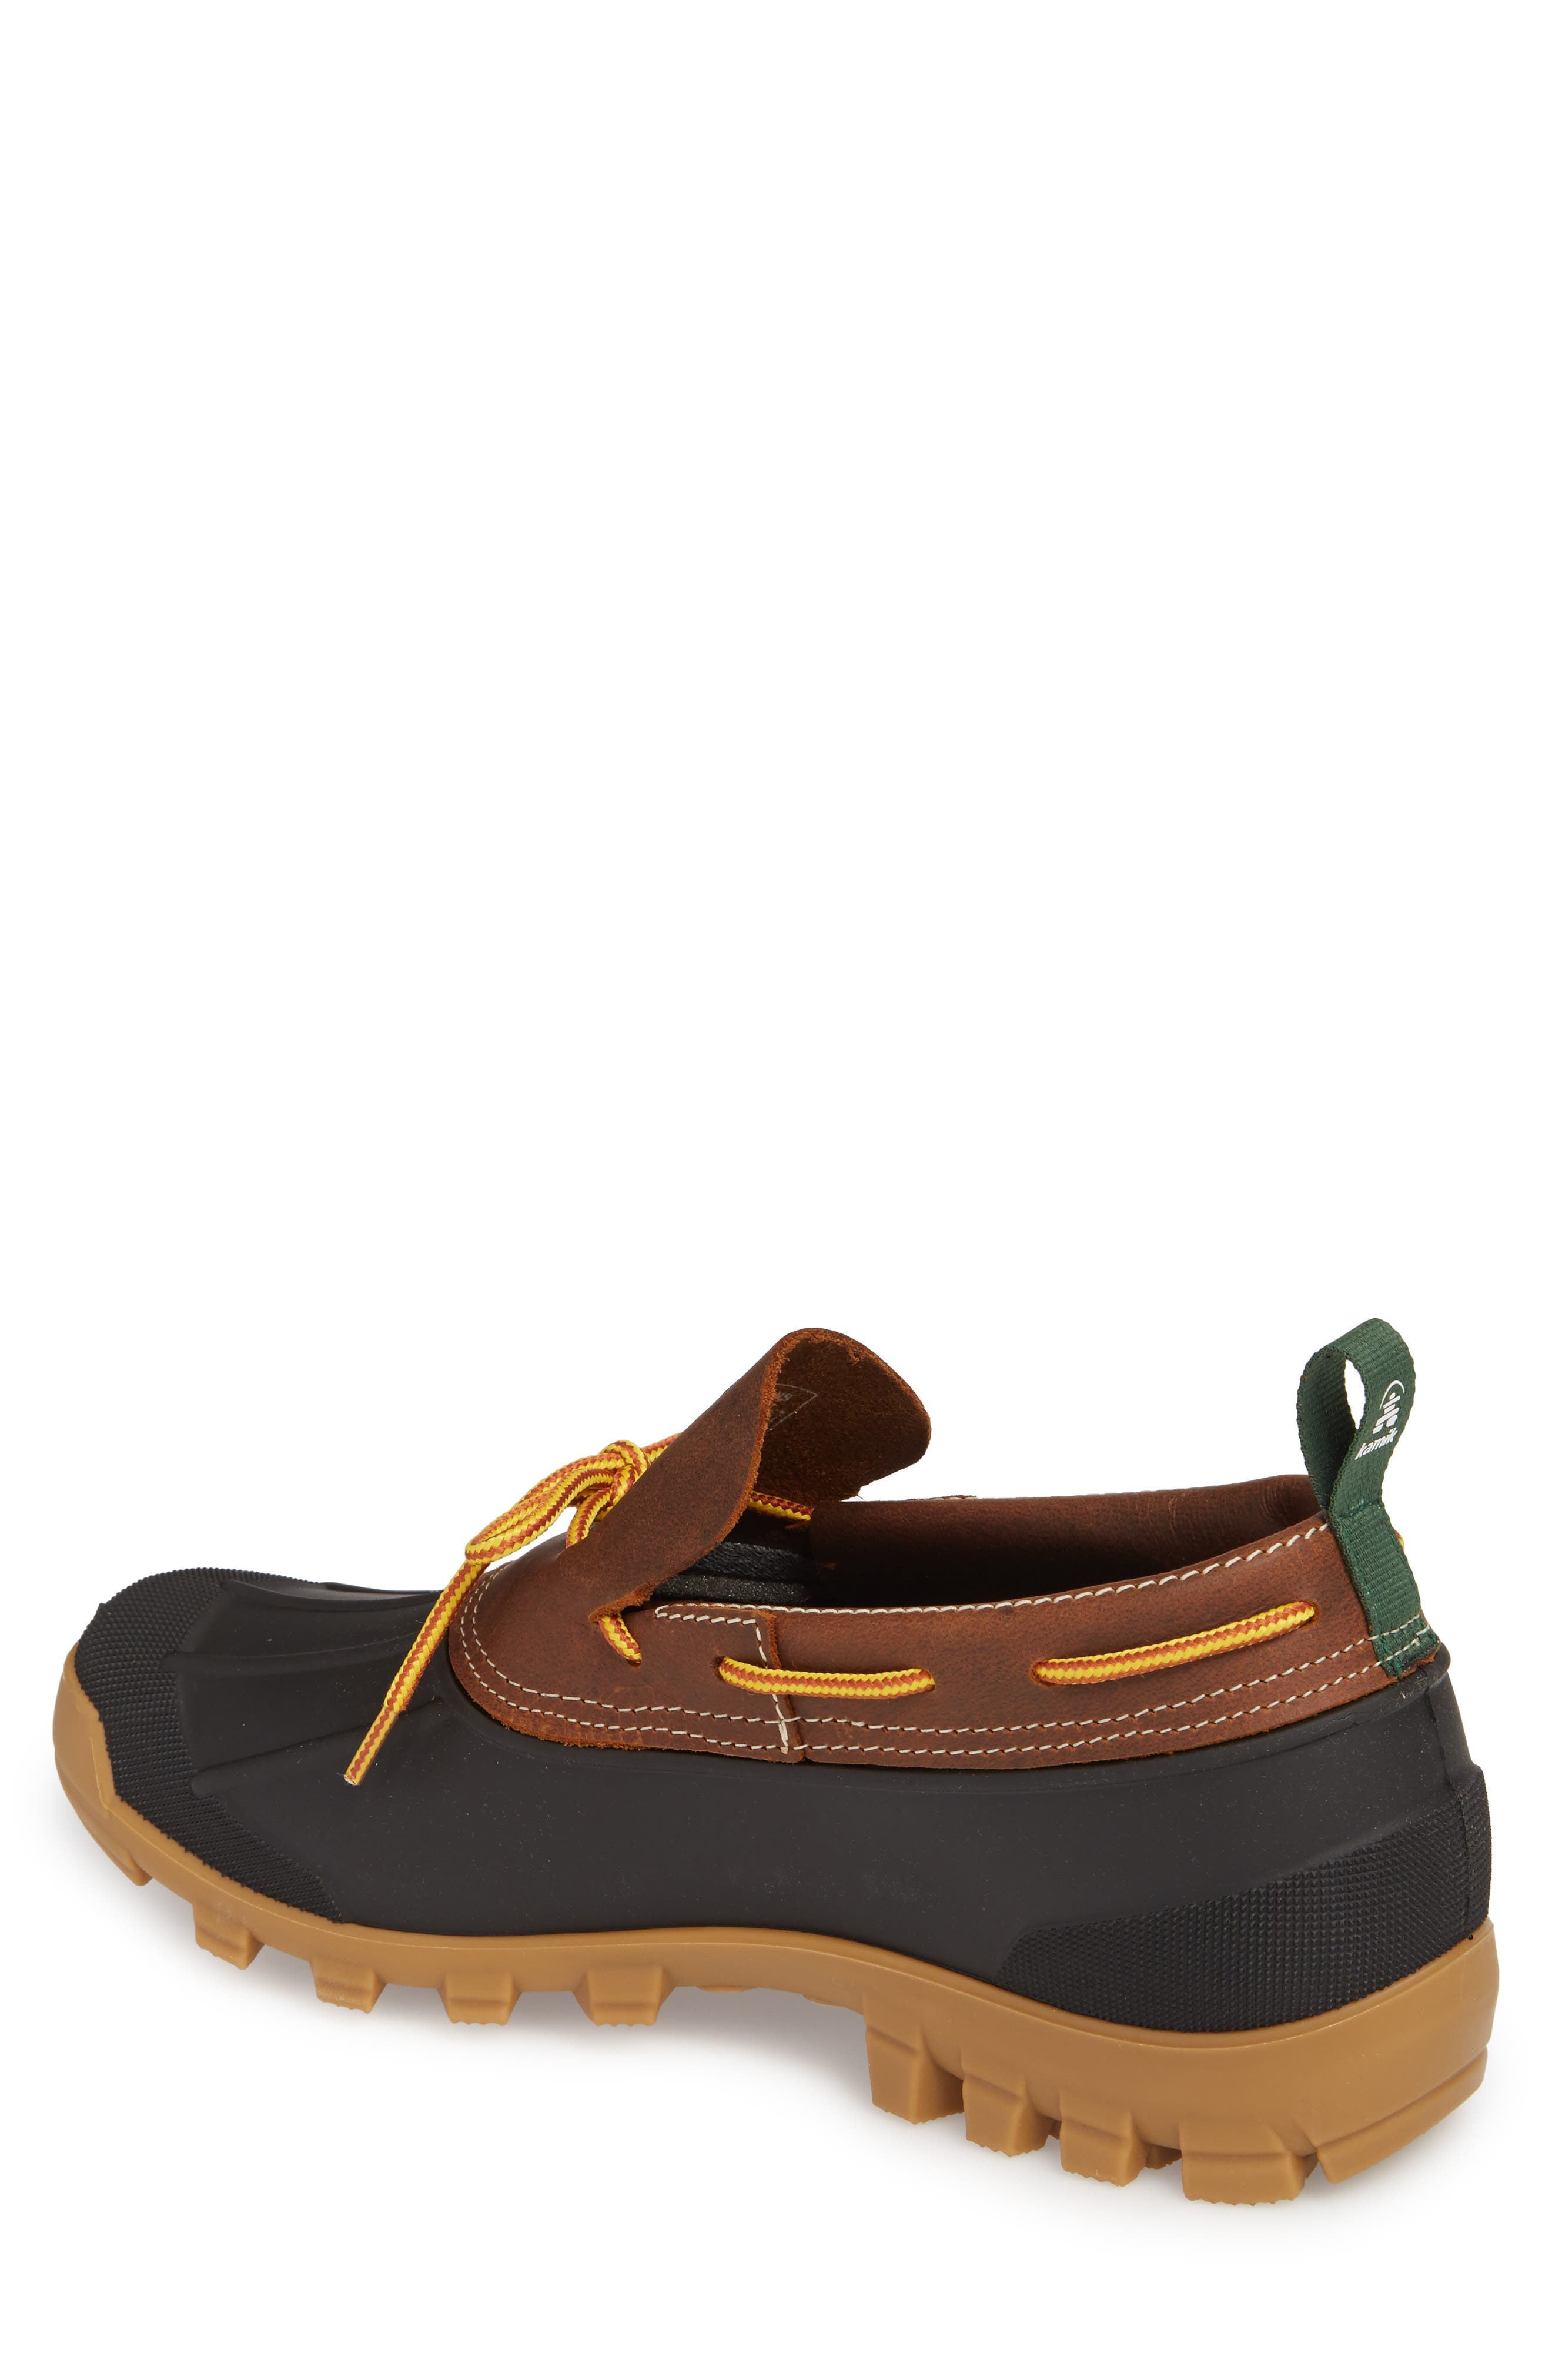 Yukon Short Boot,                             Alternate thumbnail 2, color,                             Dark Brown Leather